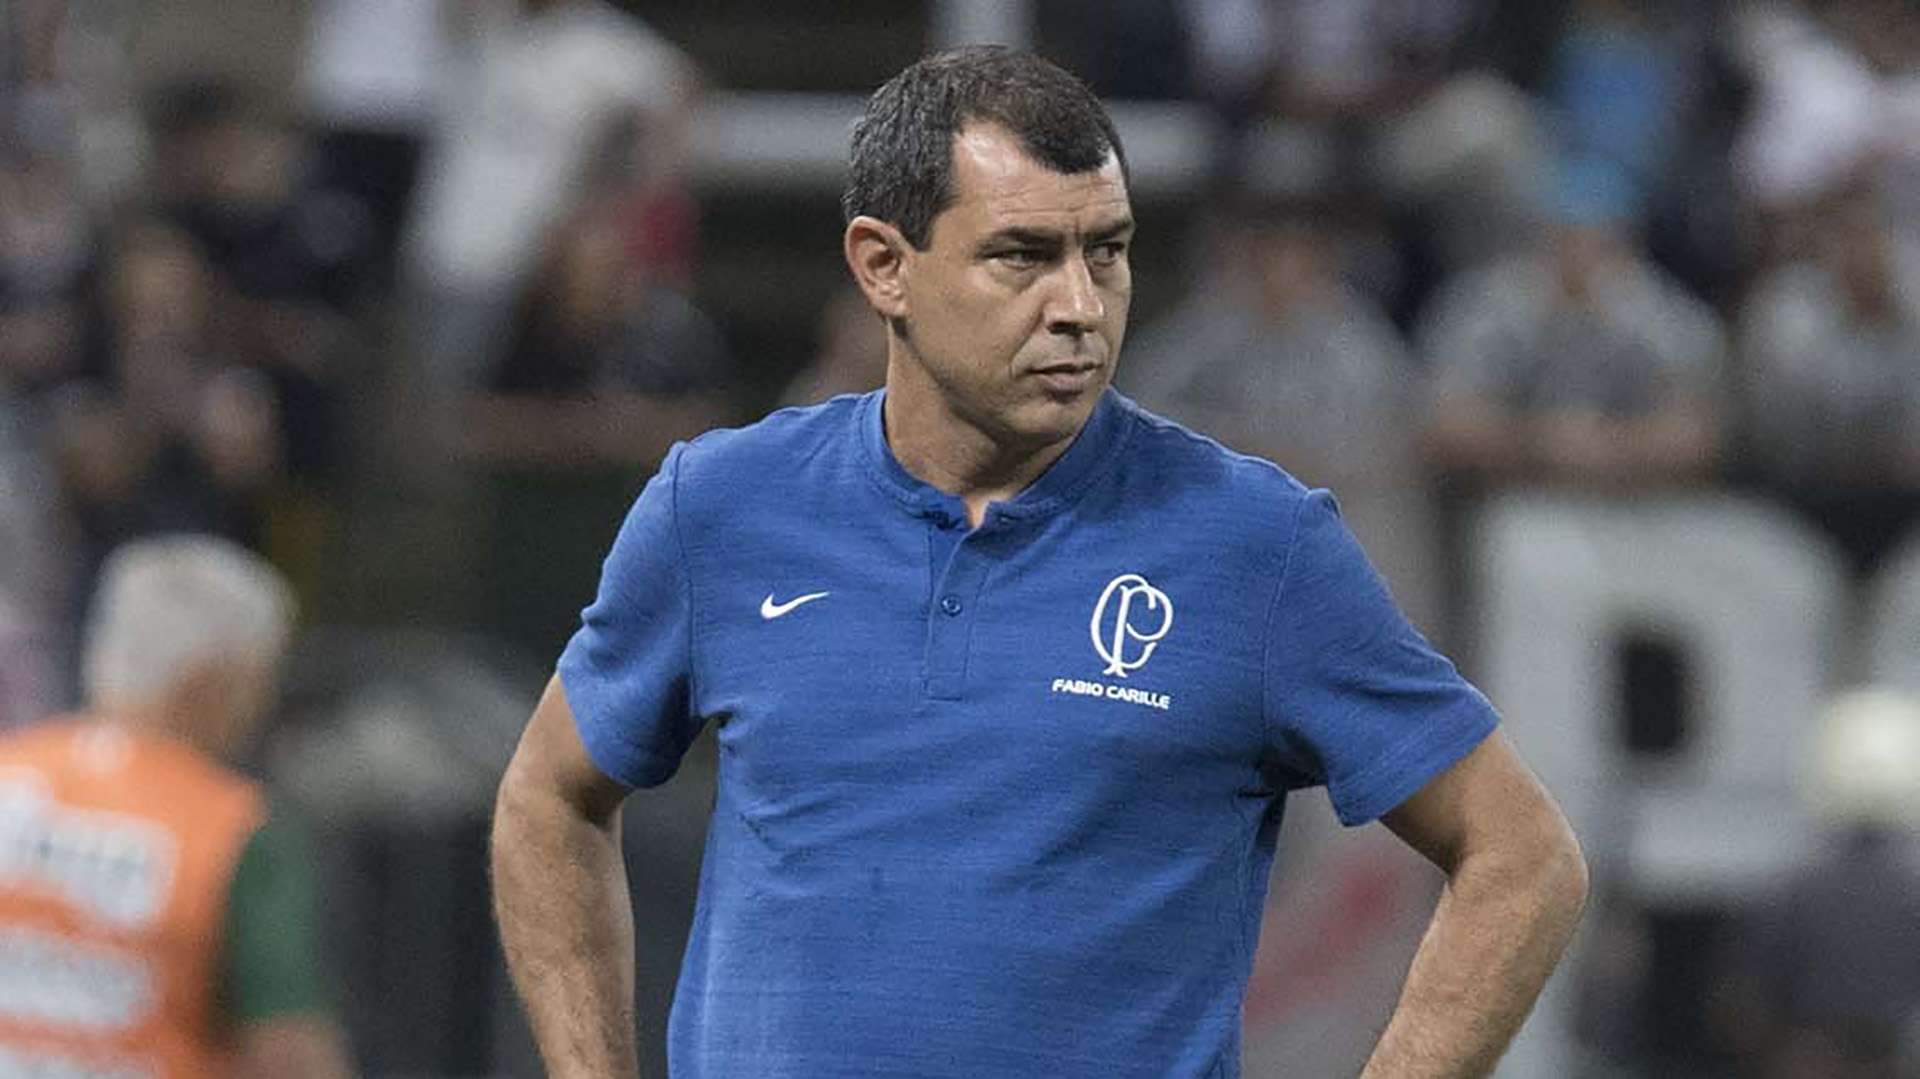 Fabio Carille Corinthians Avenida Copa do Brasil 20022019